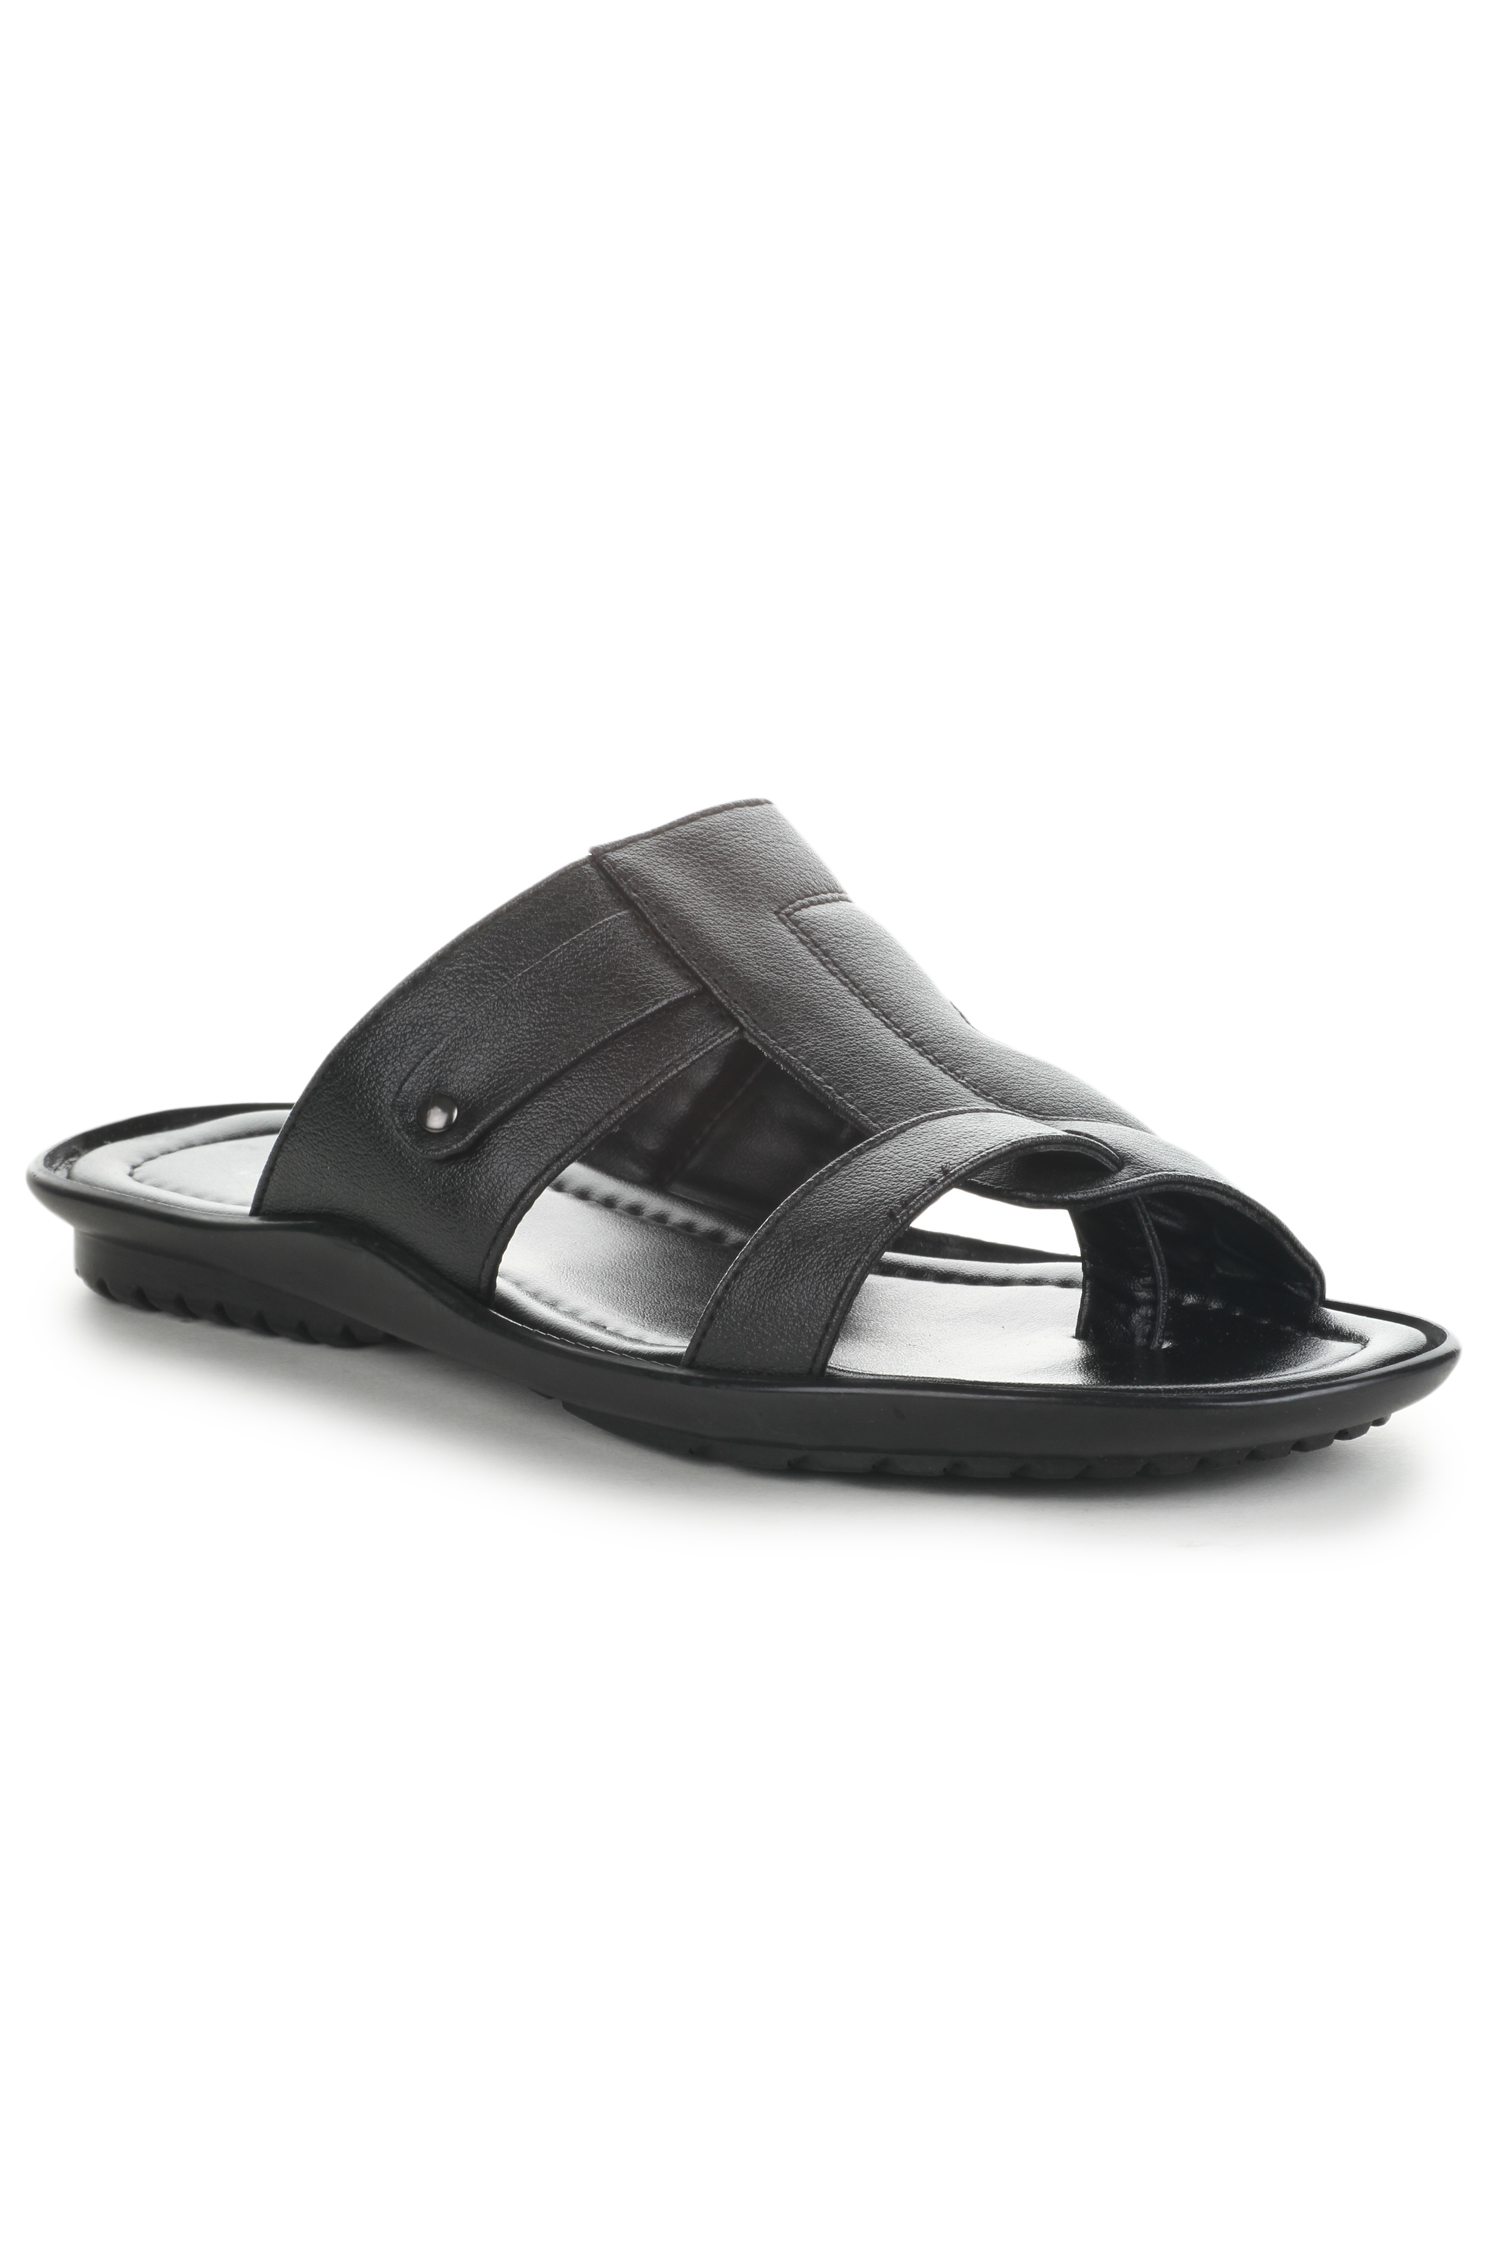 Liberty | Liberty Coolers Black Formal Slippers LAF-227_Black For - Men